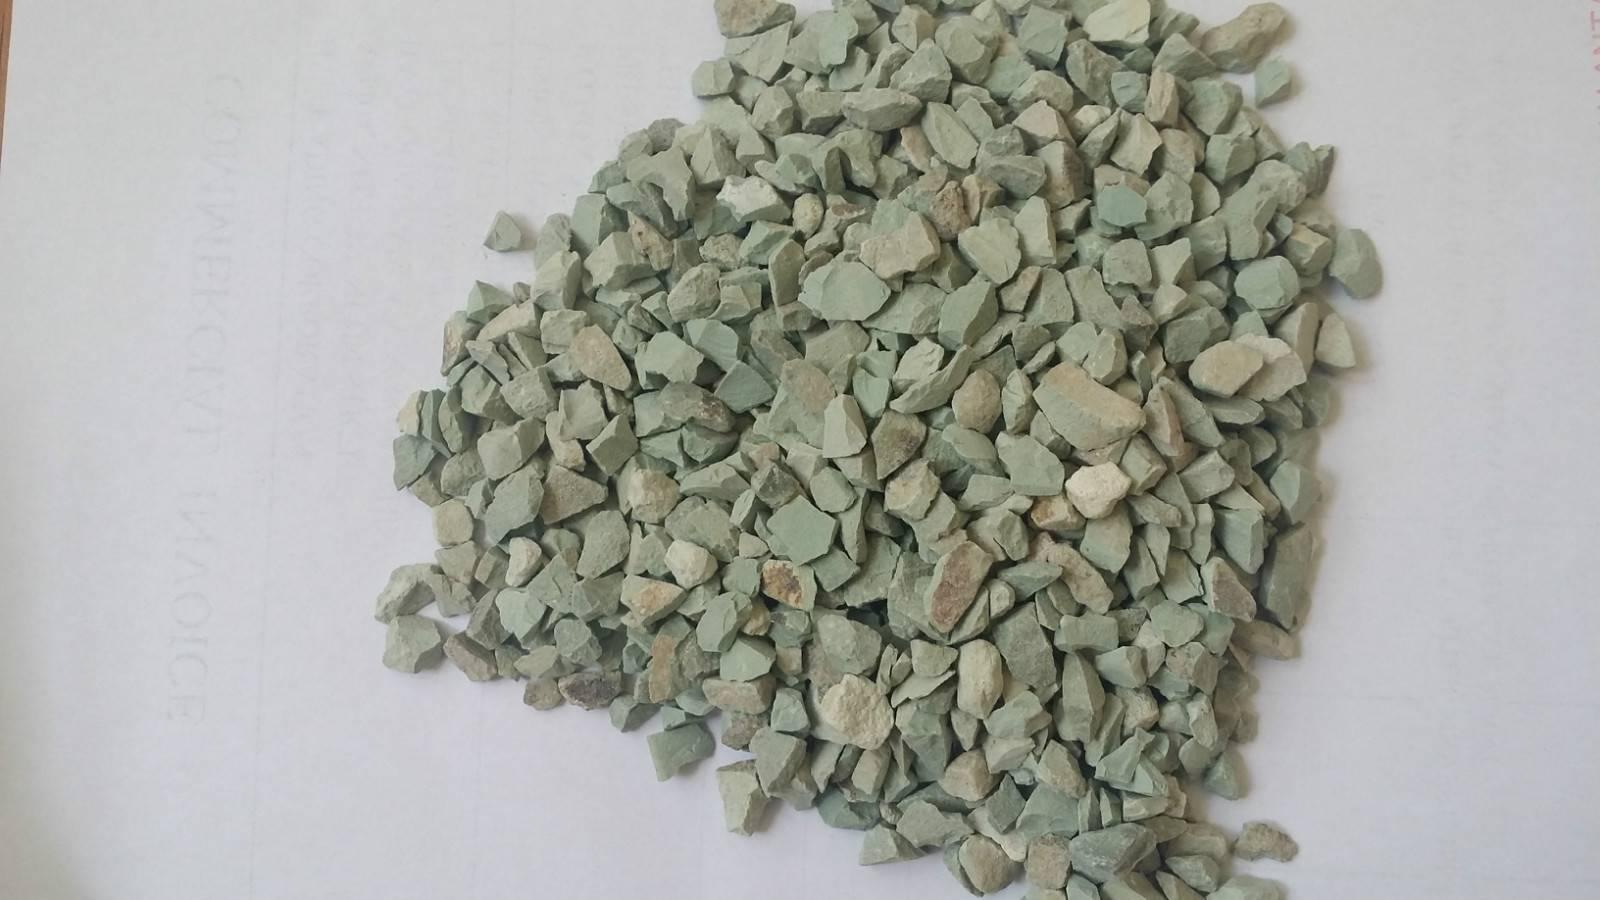 Clinoptilolite Zeolite